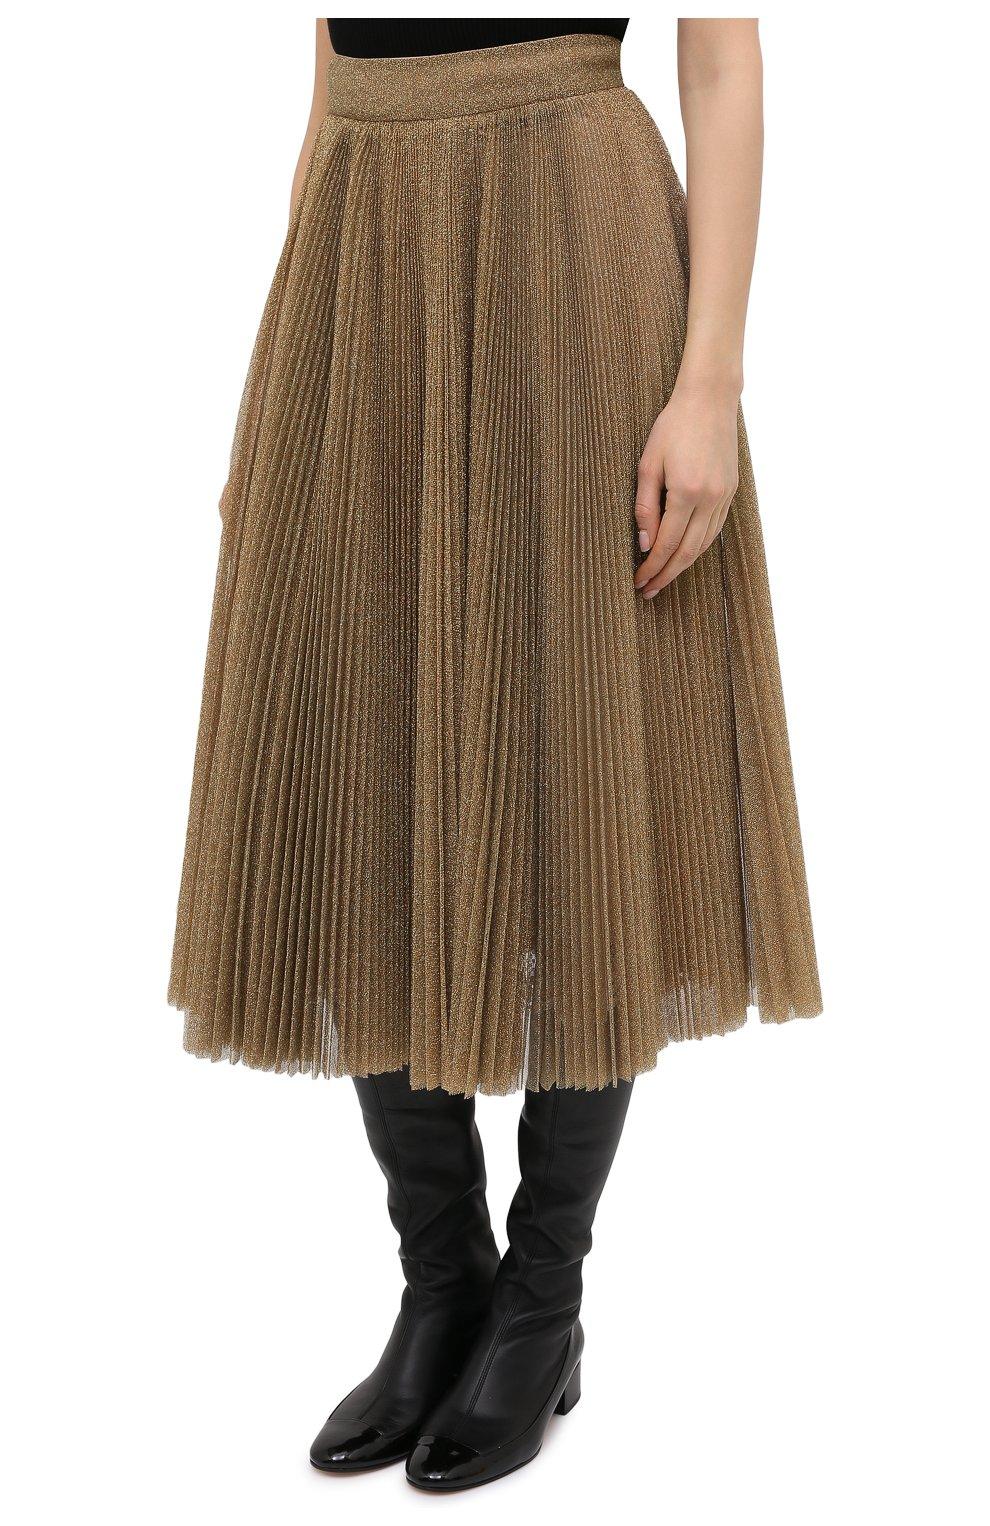 Женская юбка DOLCE & GABBANA бронзового цвета, арт. F4BYWT/FLMGR | Фото 3